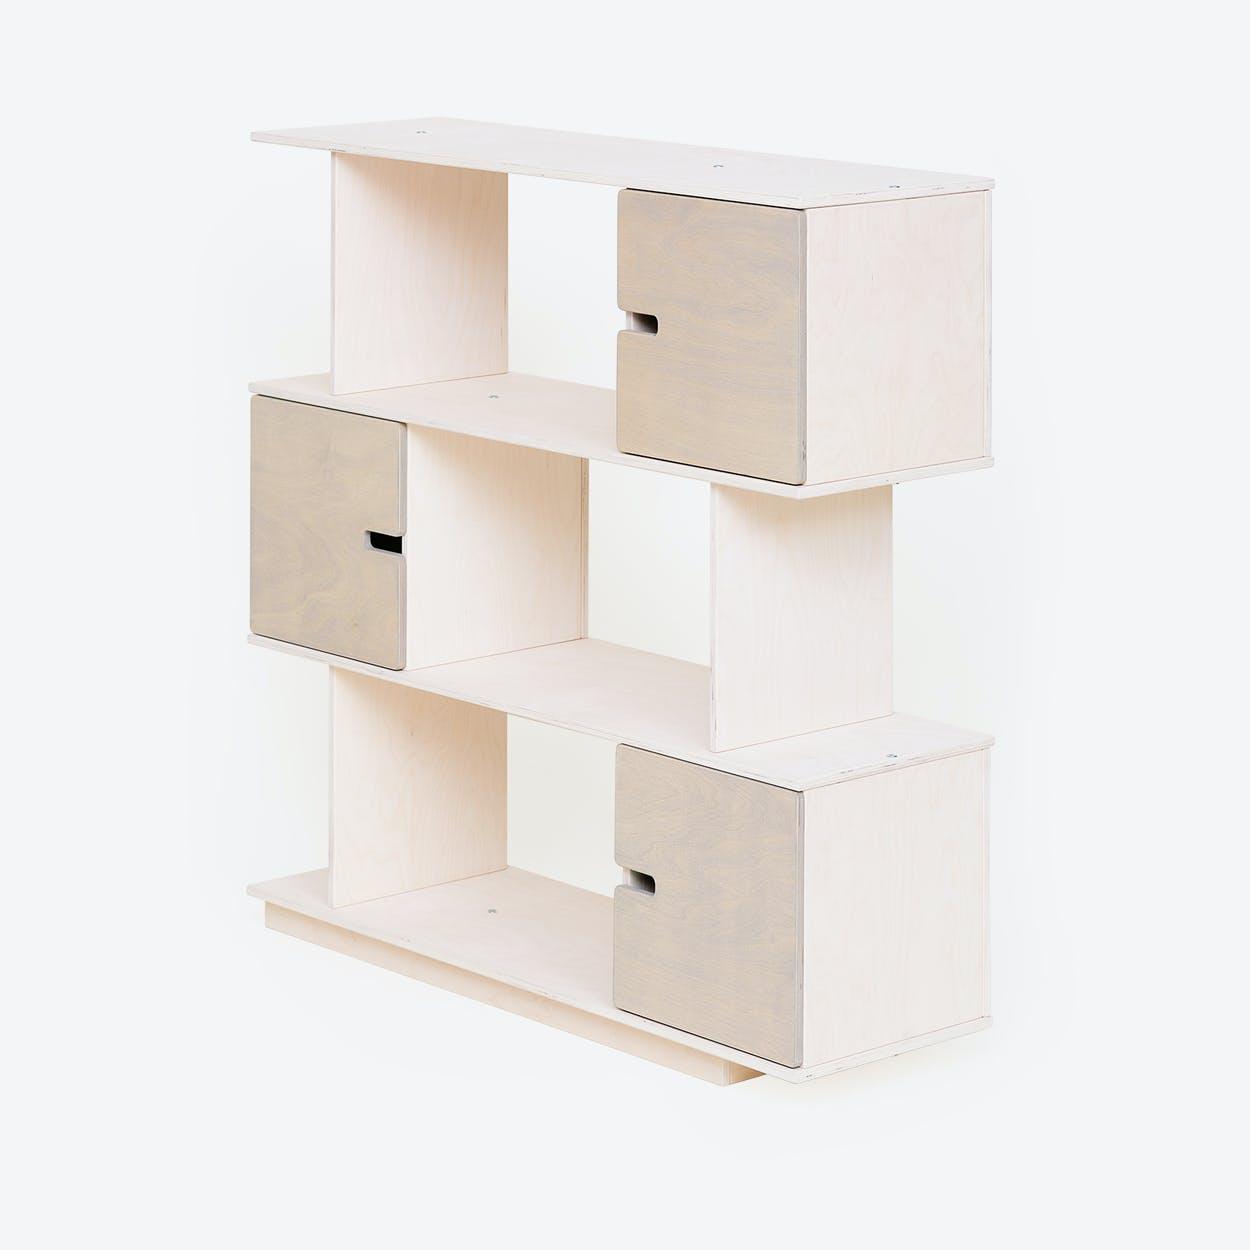 Shelf PIX 3-Levels in White/Light Grey